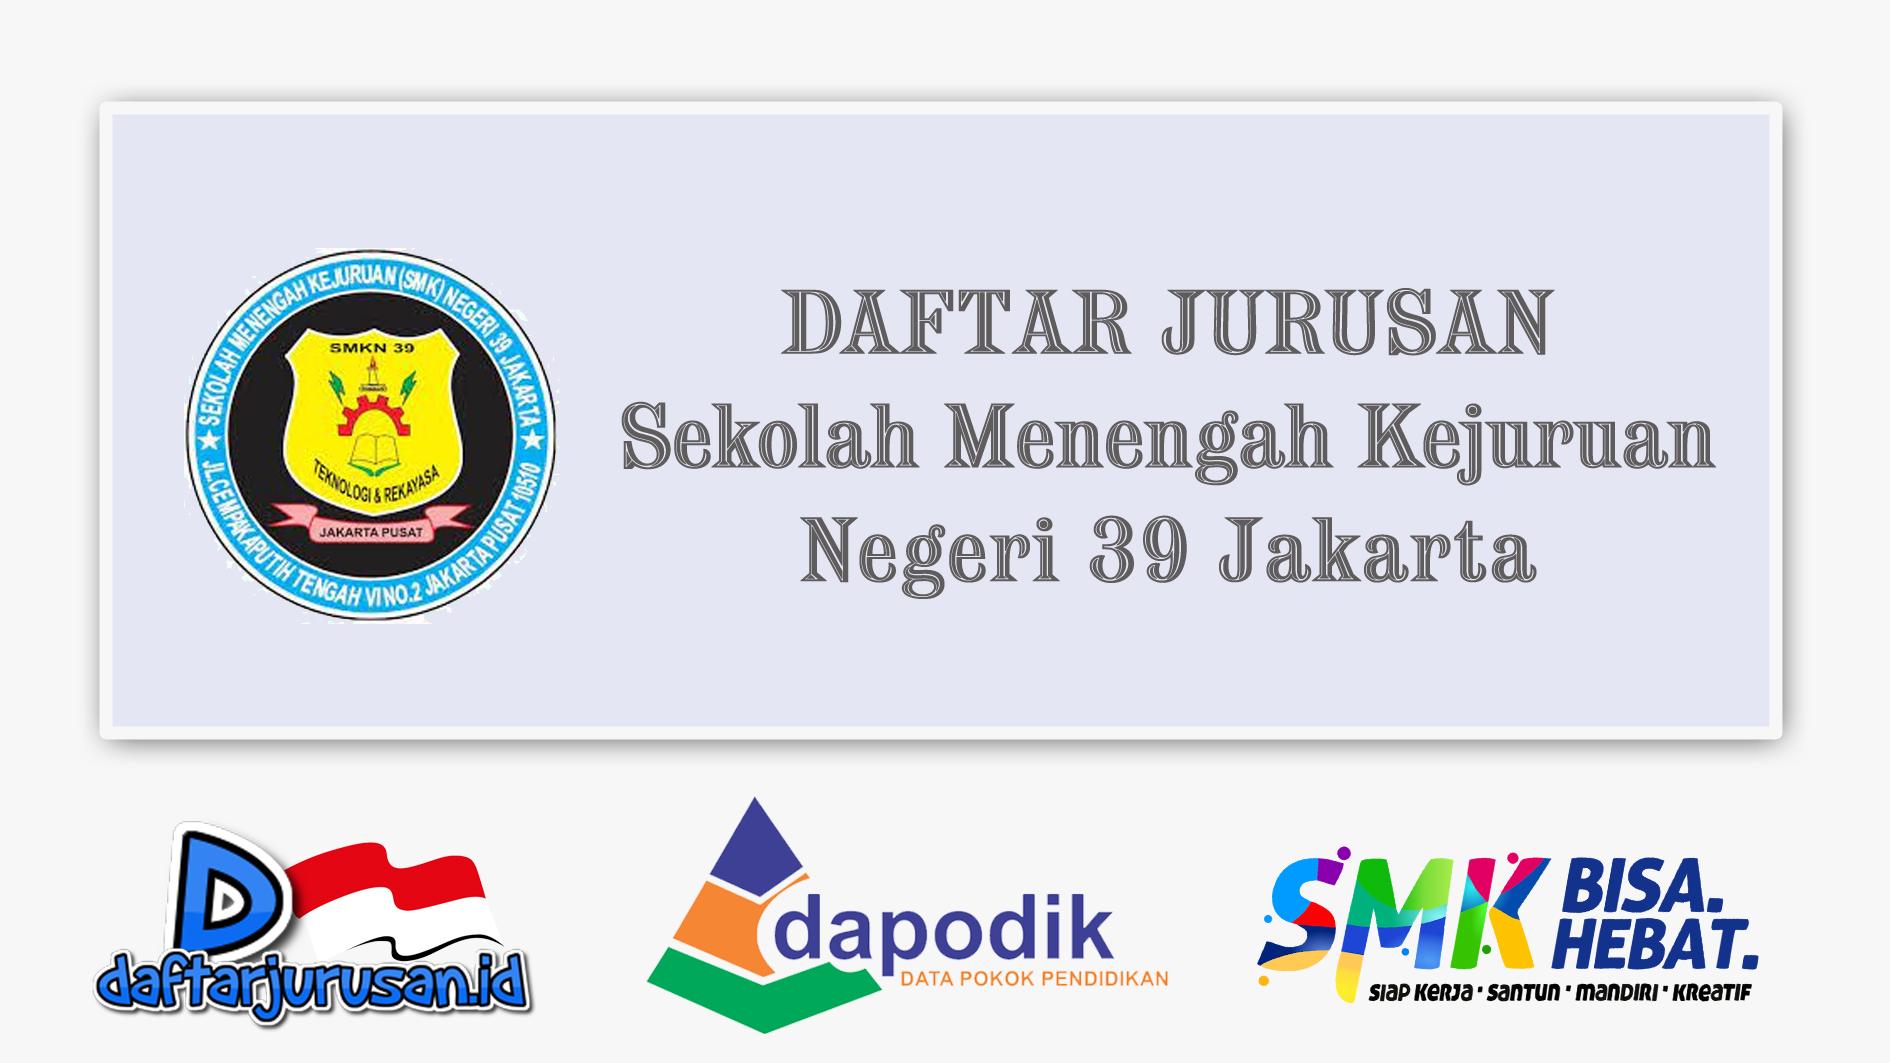 Daftar Jurusan SMK Negeri 39 Jakarta Pusat